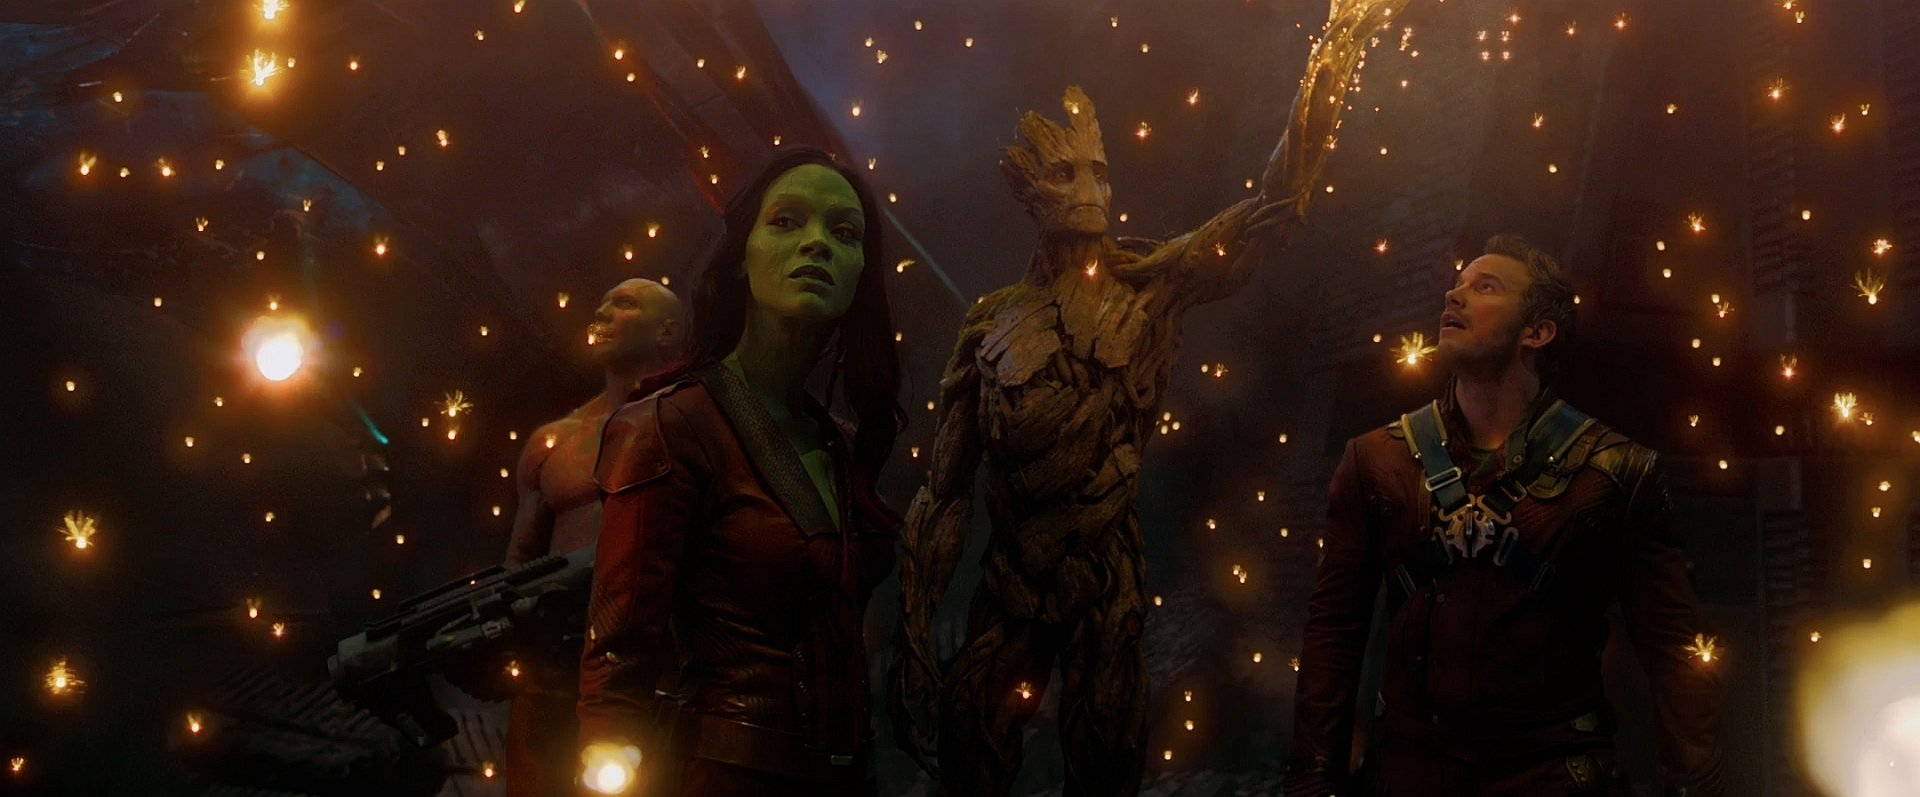 Movie - Guardians of the Galaxy  Drax The Destroyer Groot Gamora Zoe Saldana Chris Pratt Peter Quill Dave Bautista Wallpaper